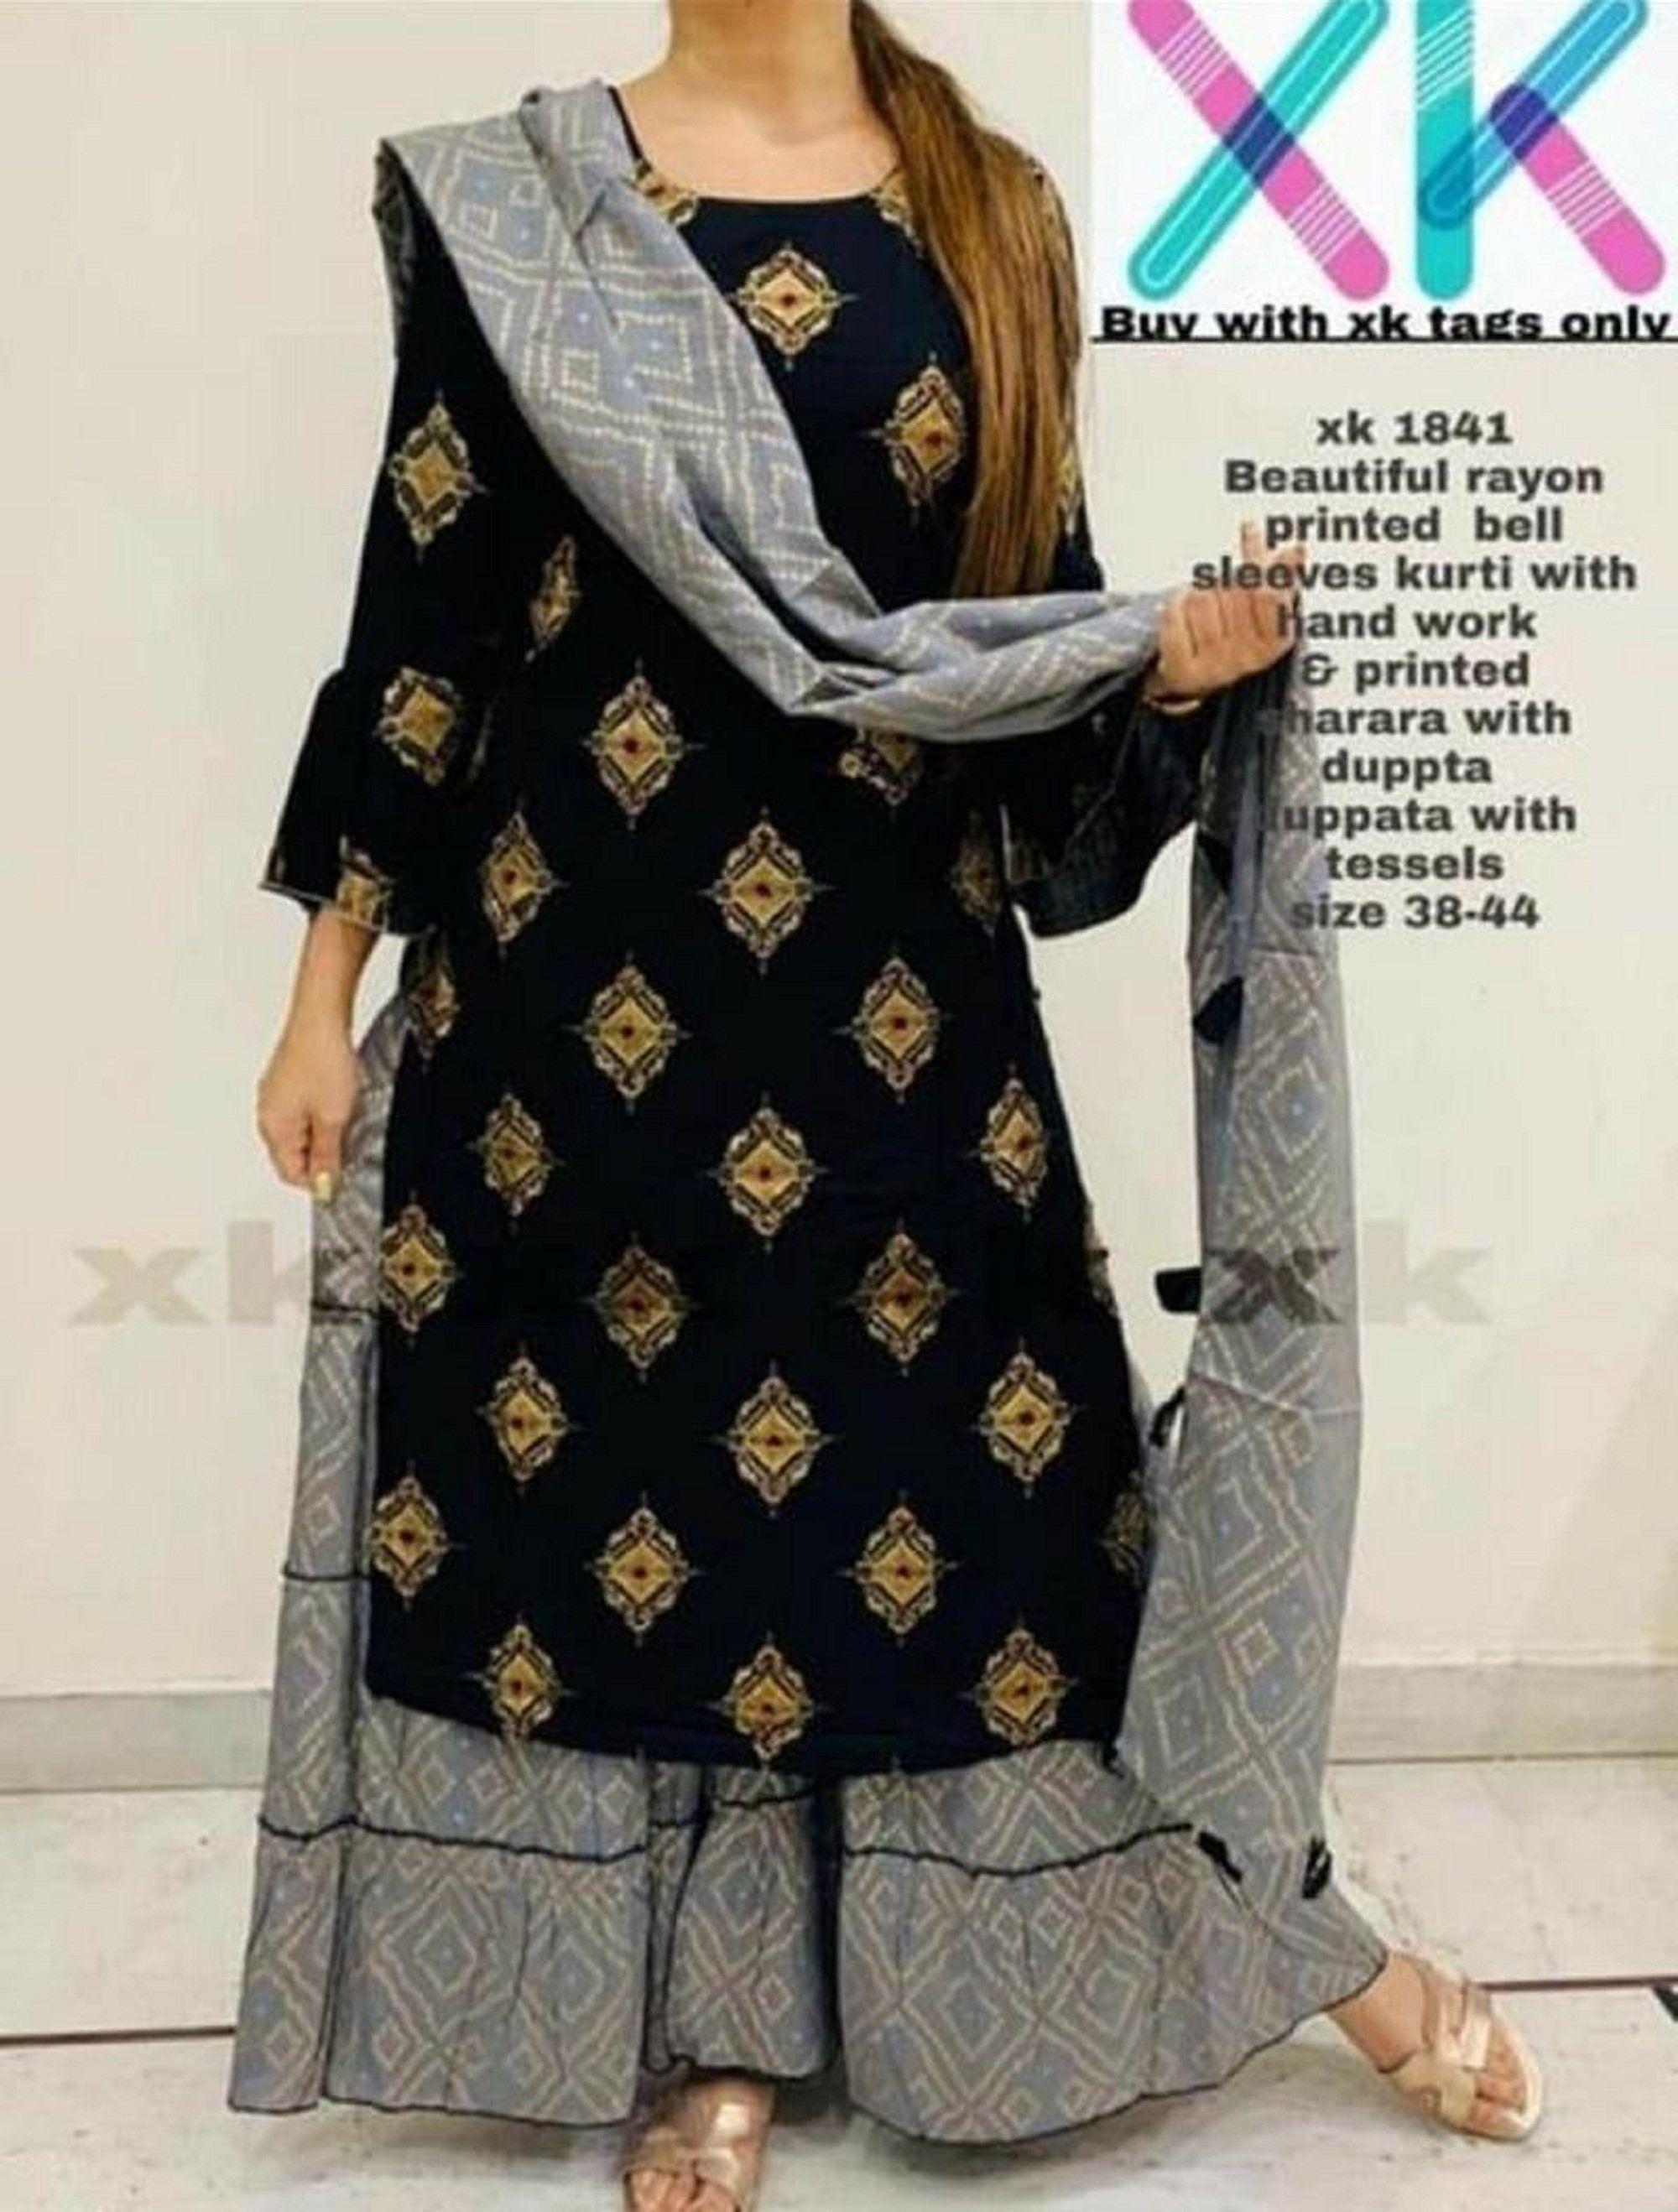 Stylish Trendy Rayon Attractive Printed Black Kurta Sahrara With Dupatta Set Indian New Designer Kurti. FREE Express Shipping In USA/UK.